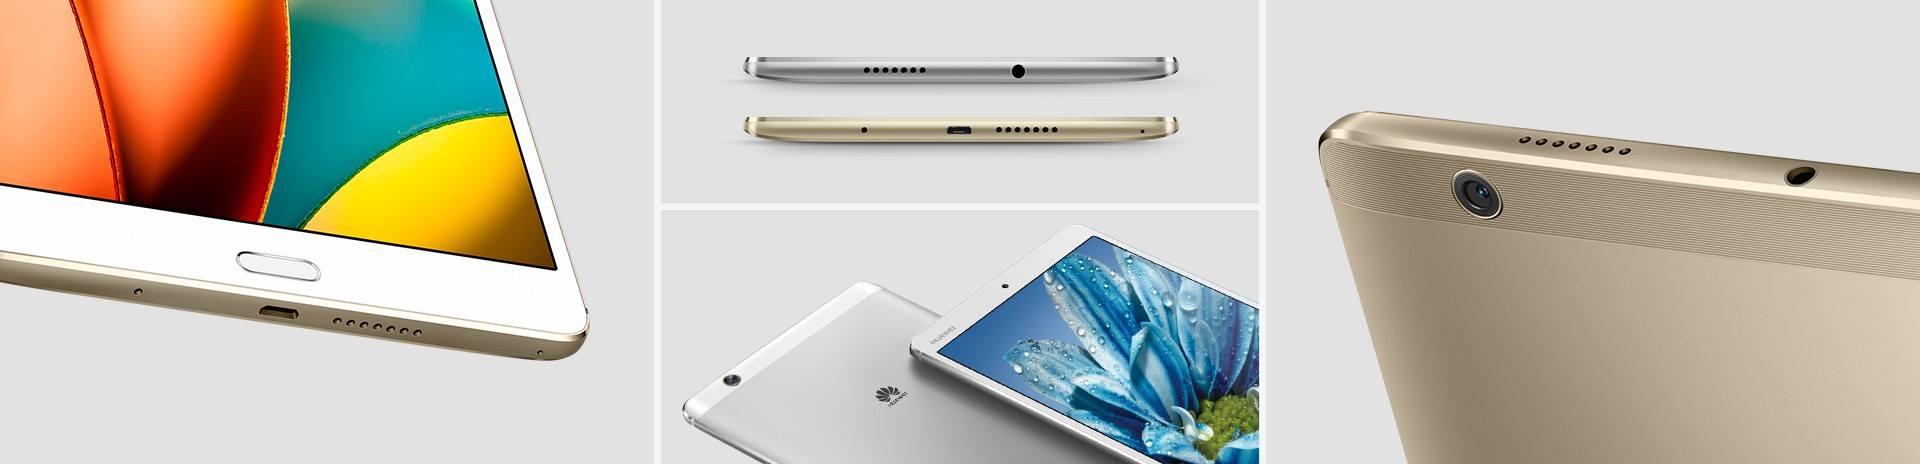 Huawei MediaPad M3 8.4 (1)